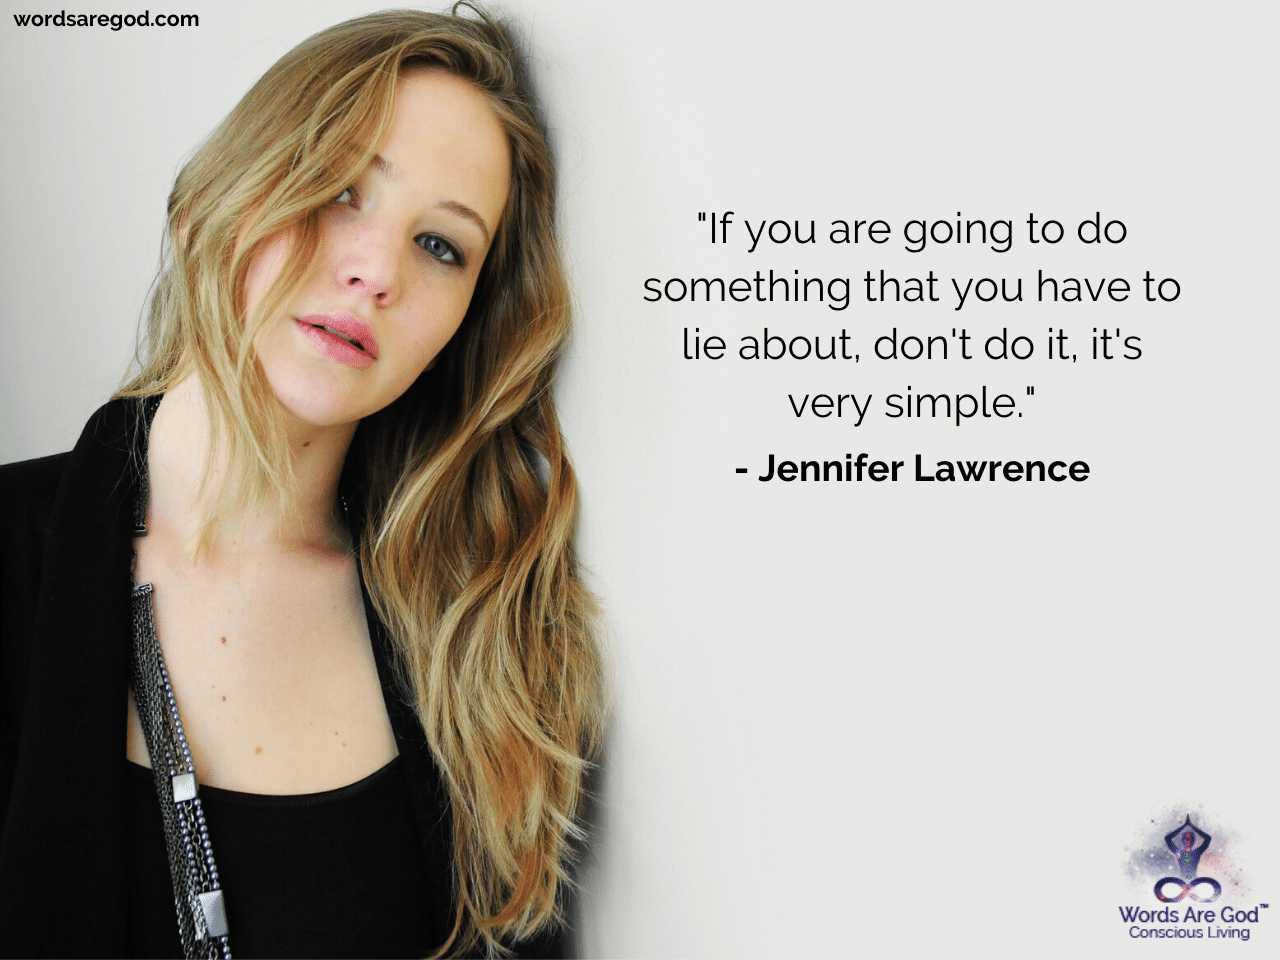 Jennifer Lawrence Inspirational Quotes by Jennifer Lawrence